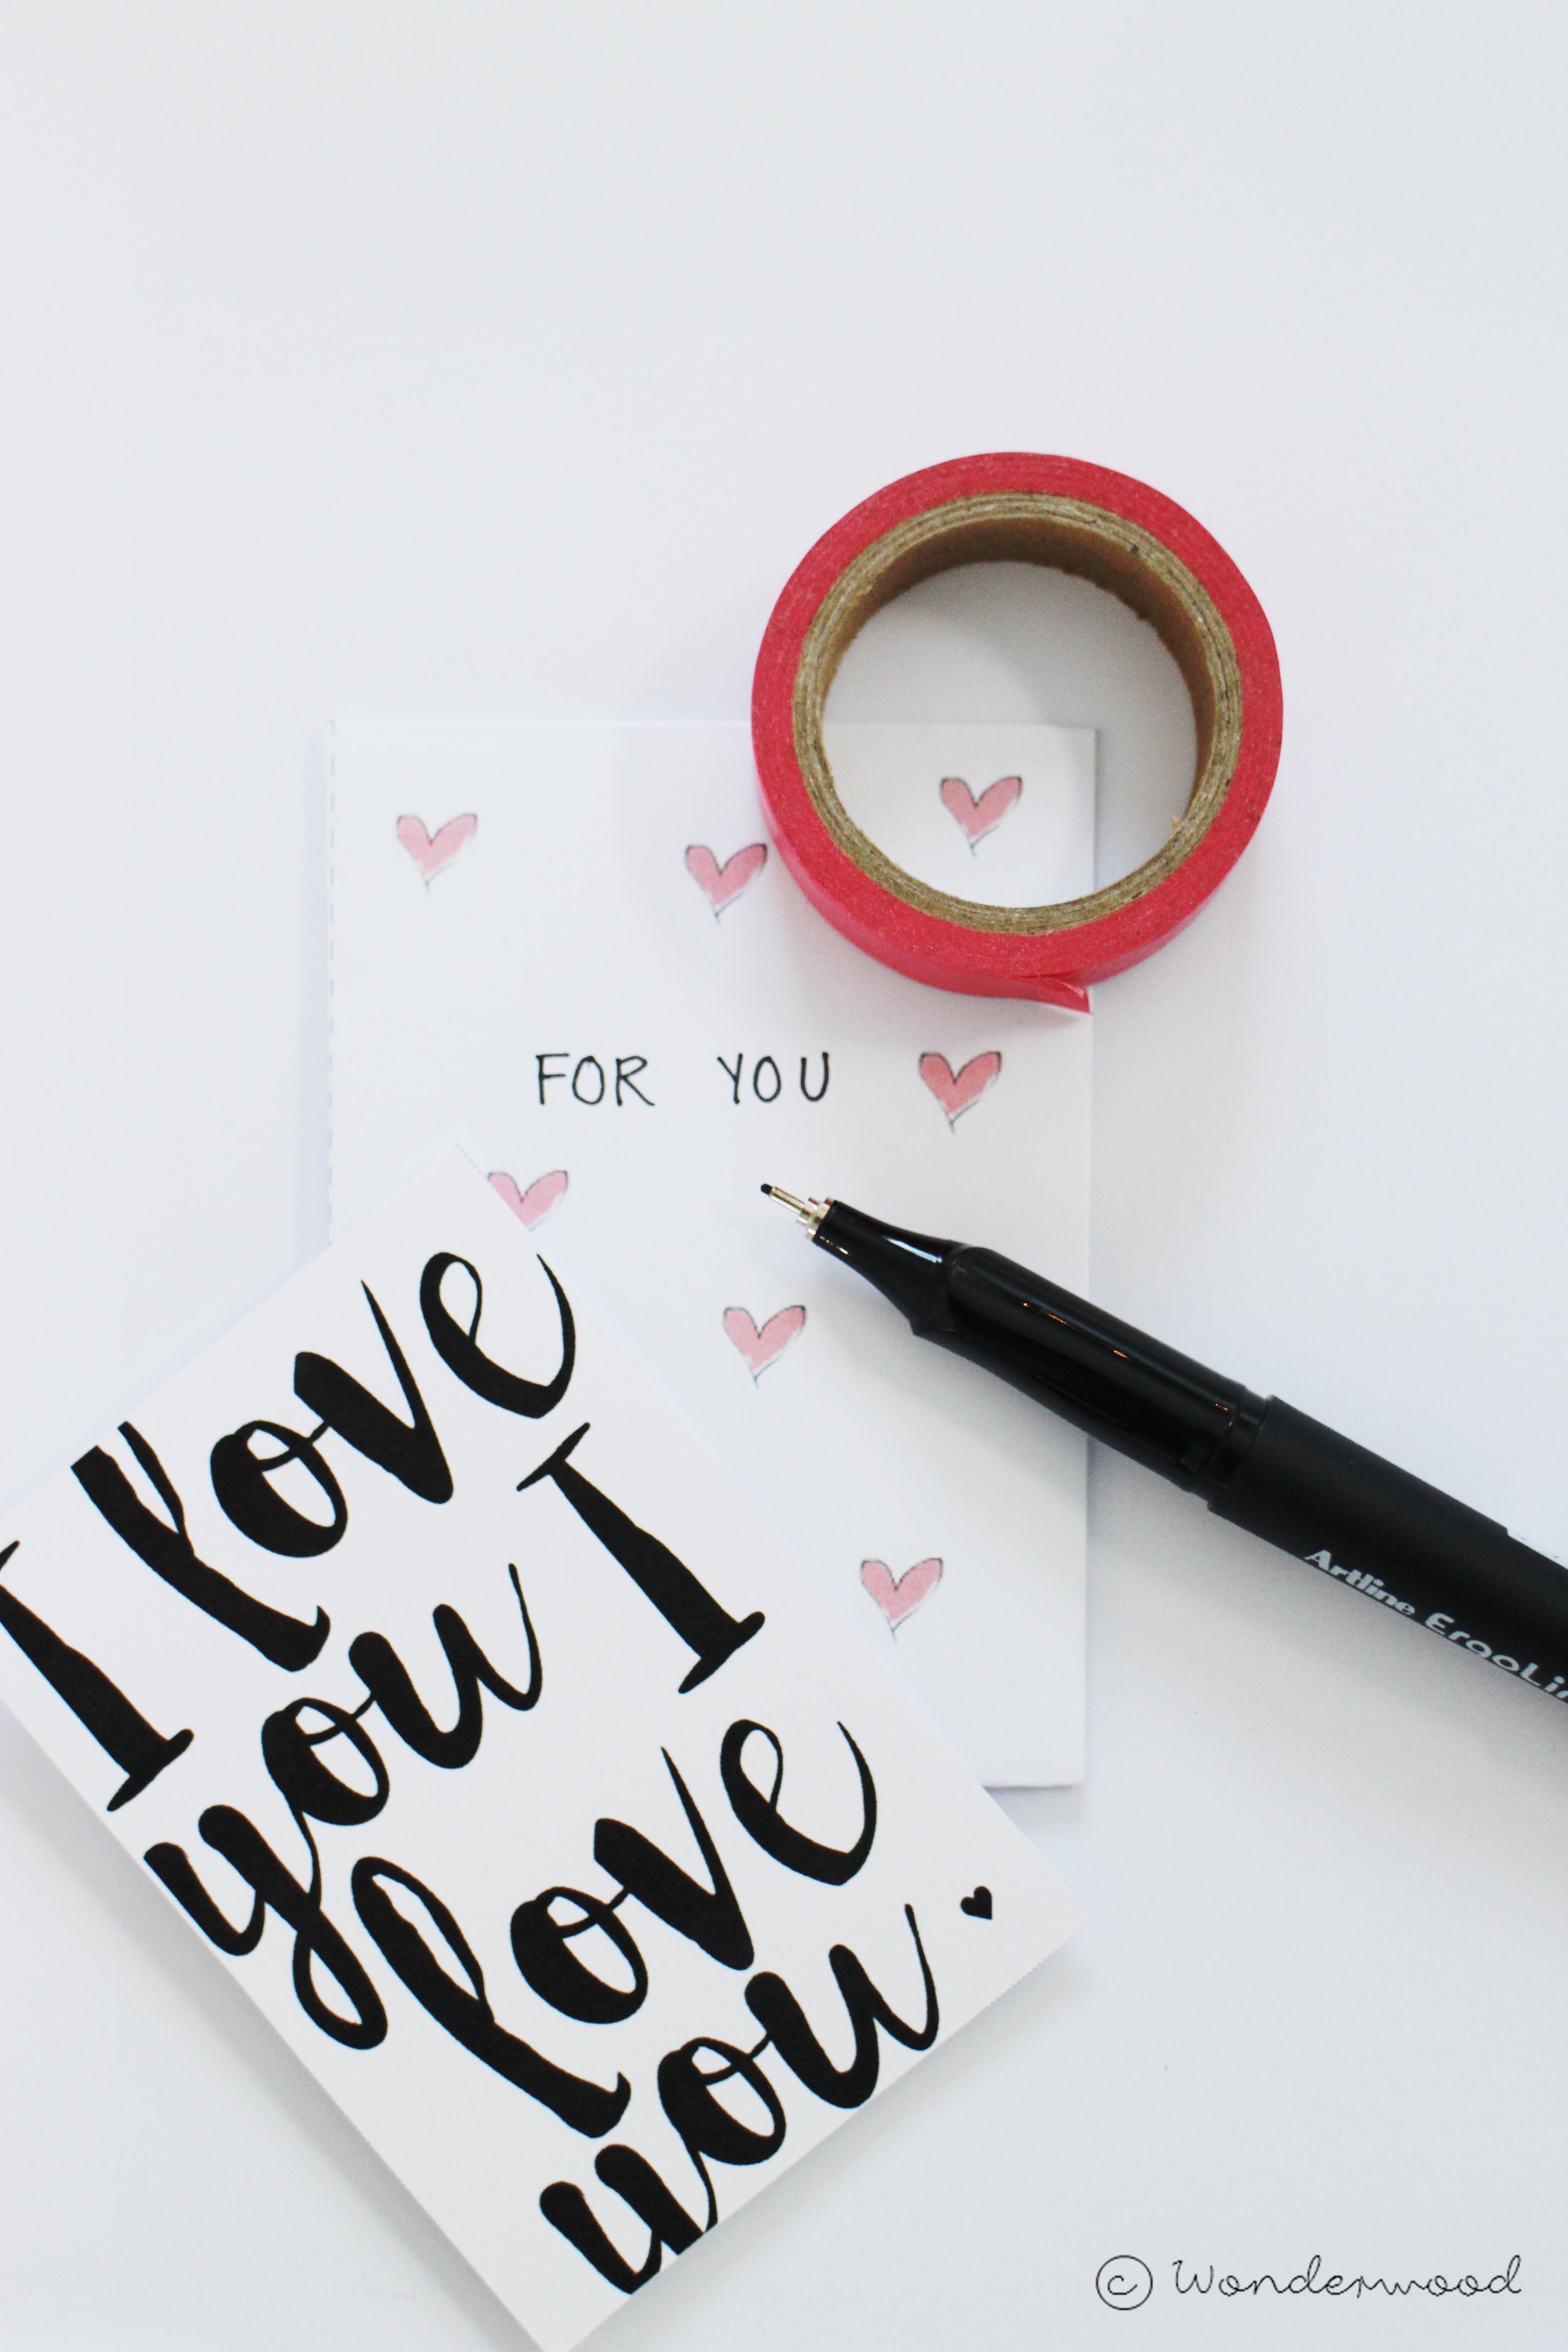 v-day cards + envelopes